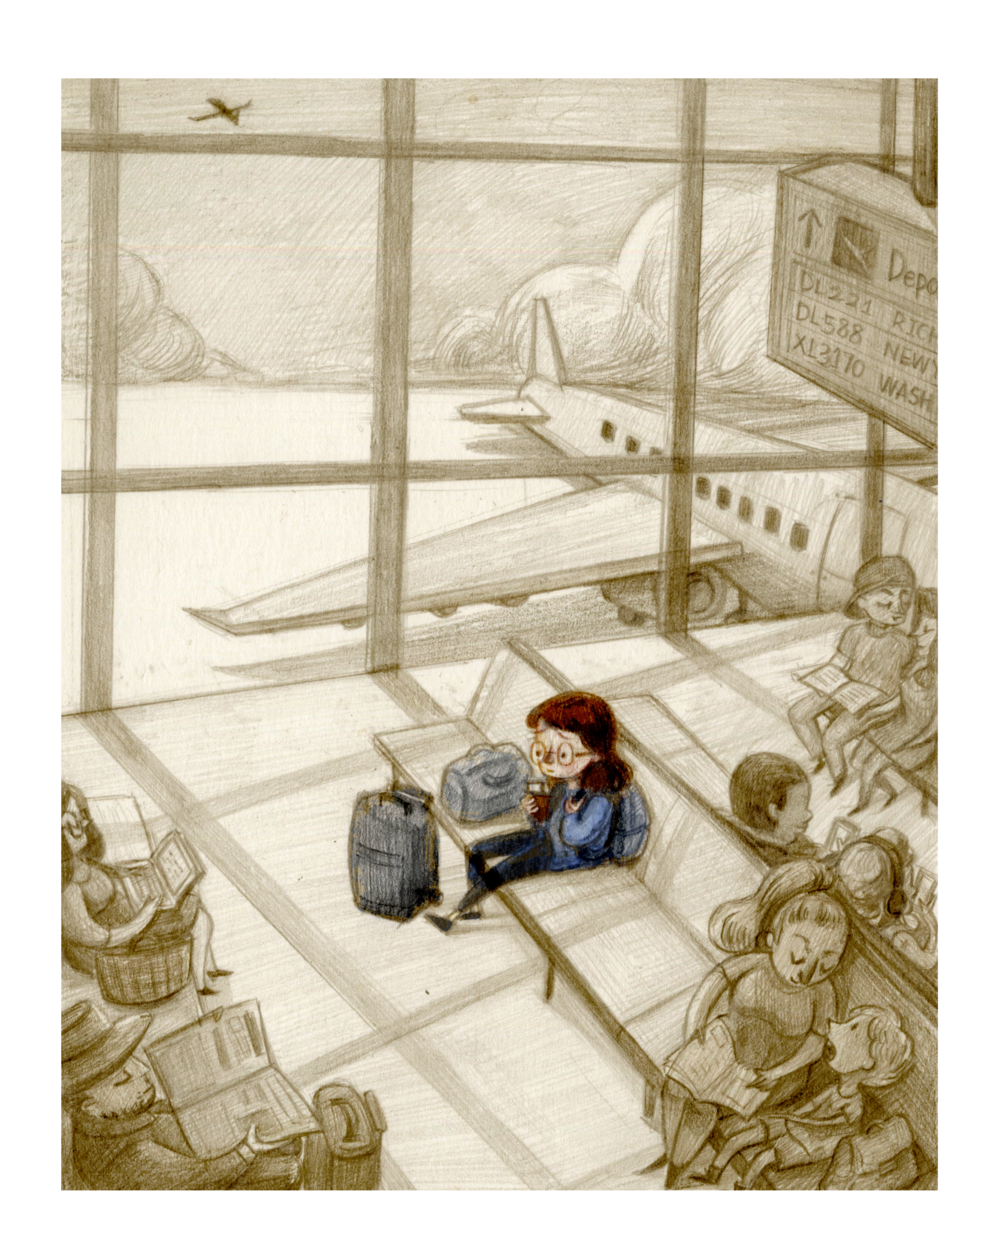 airport-sad.png